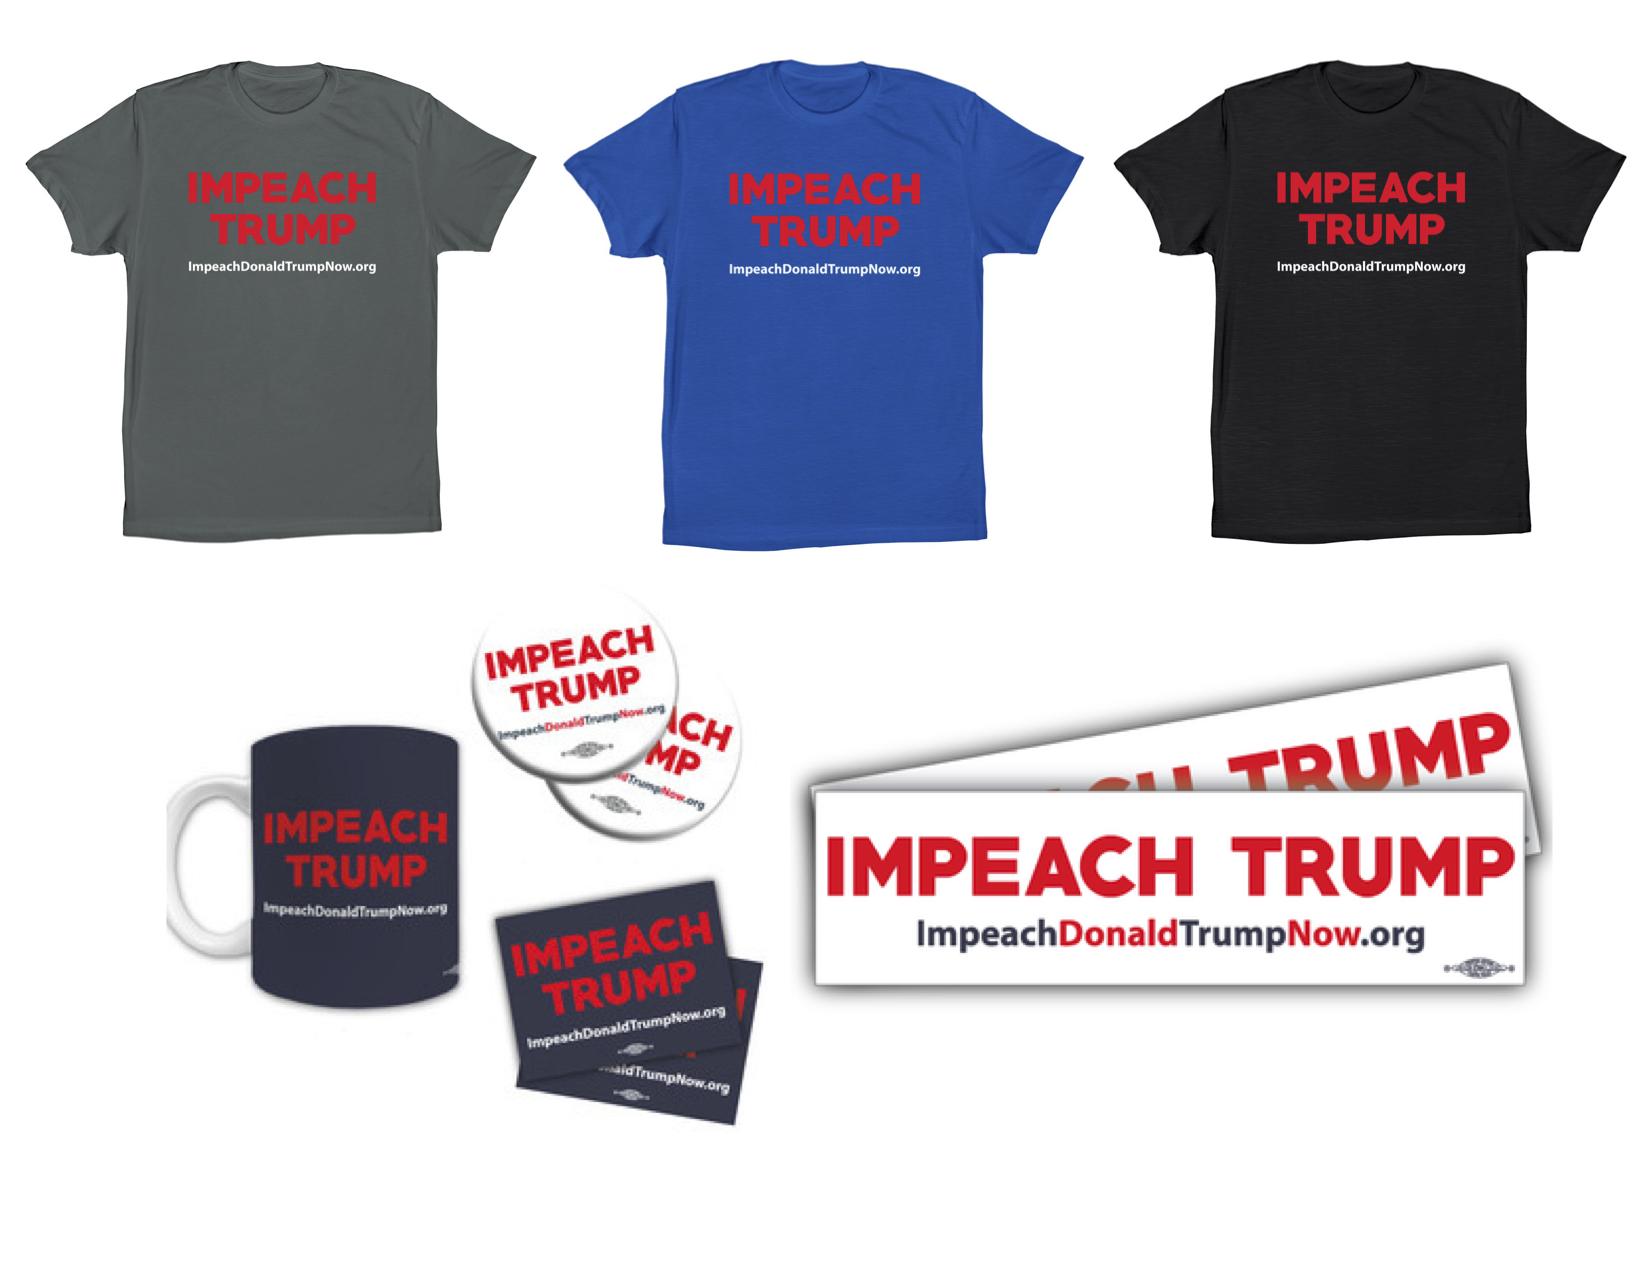 Impeachdonaldtrumpnow